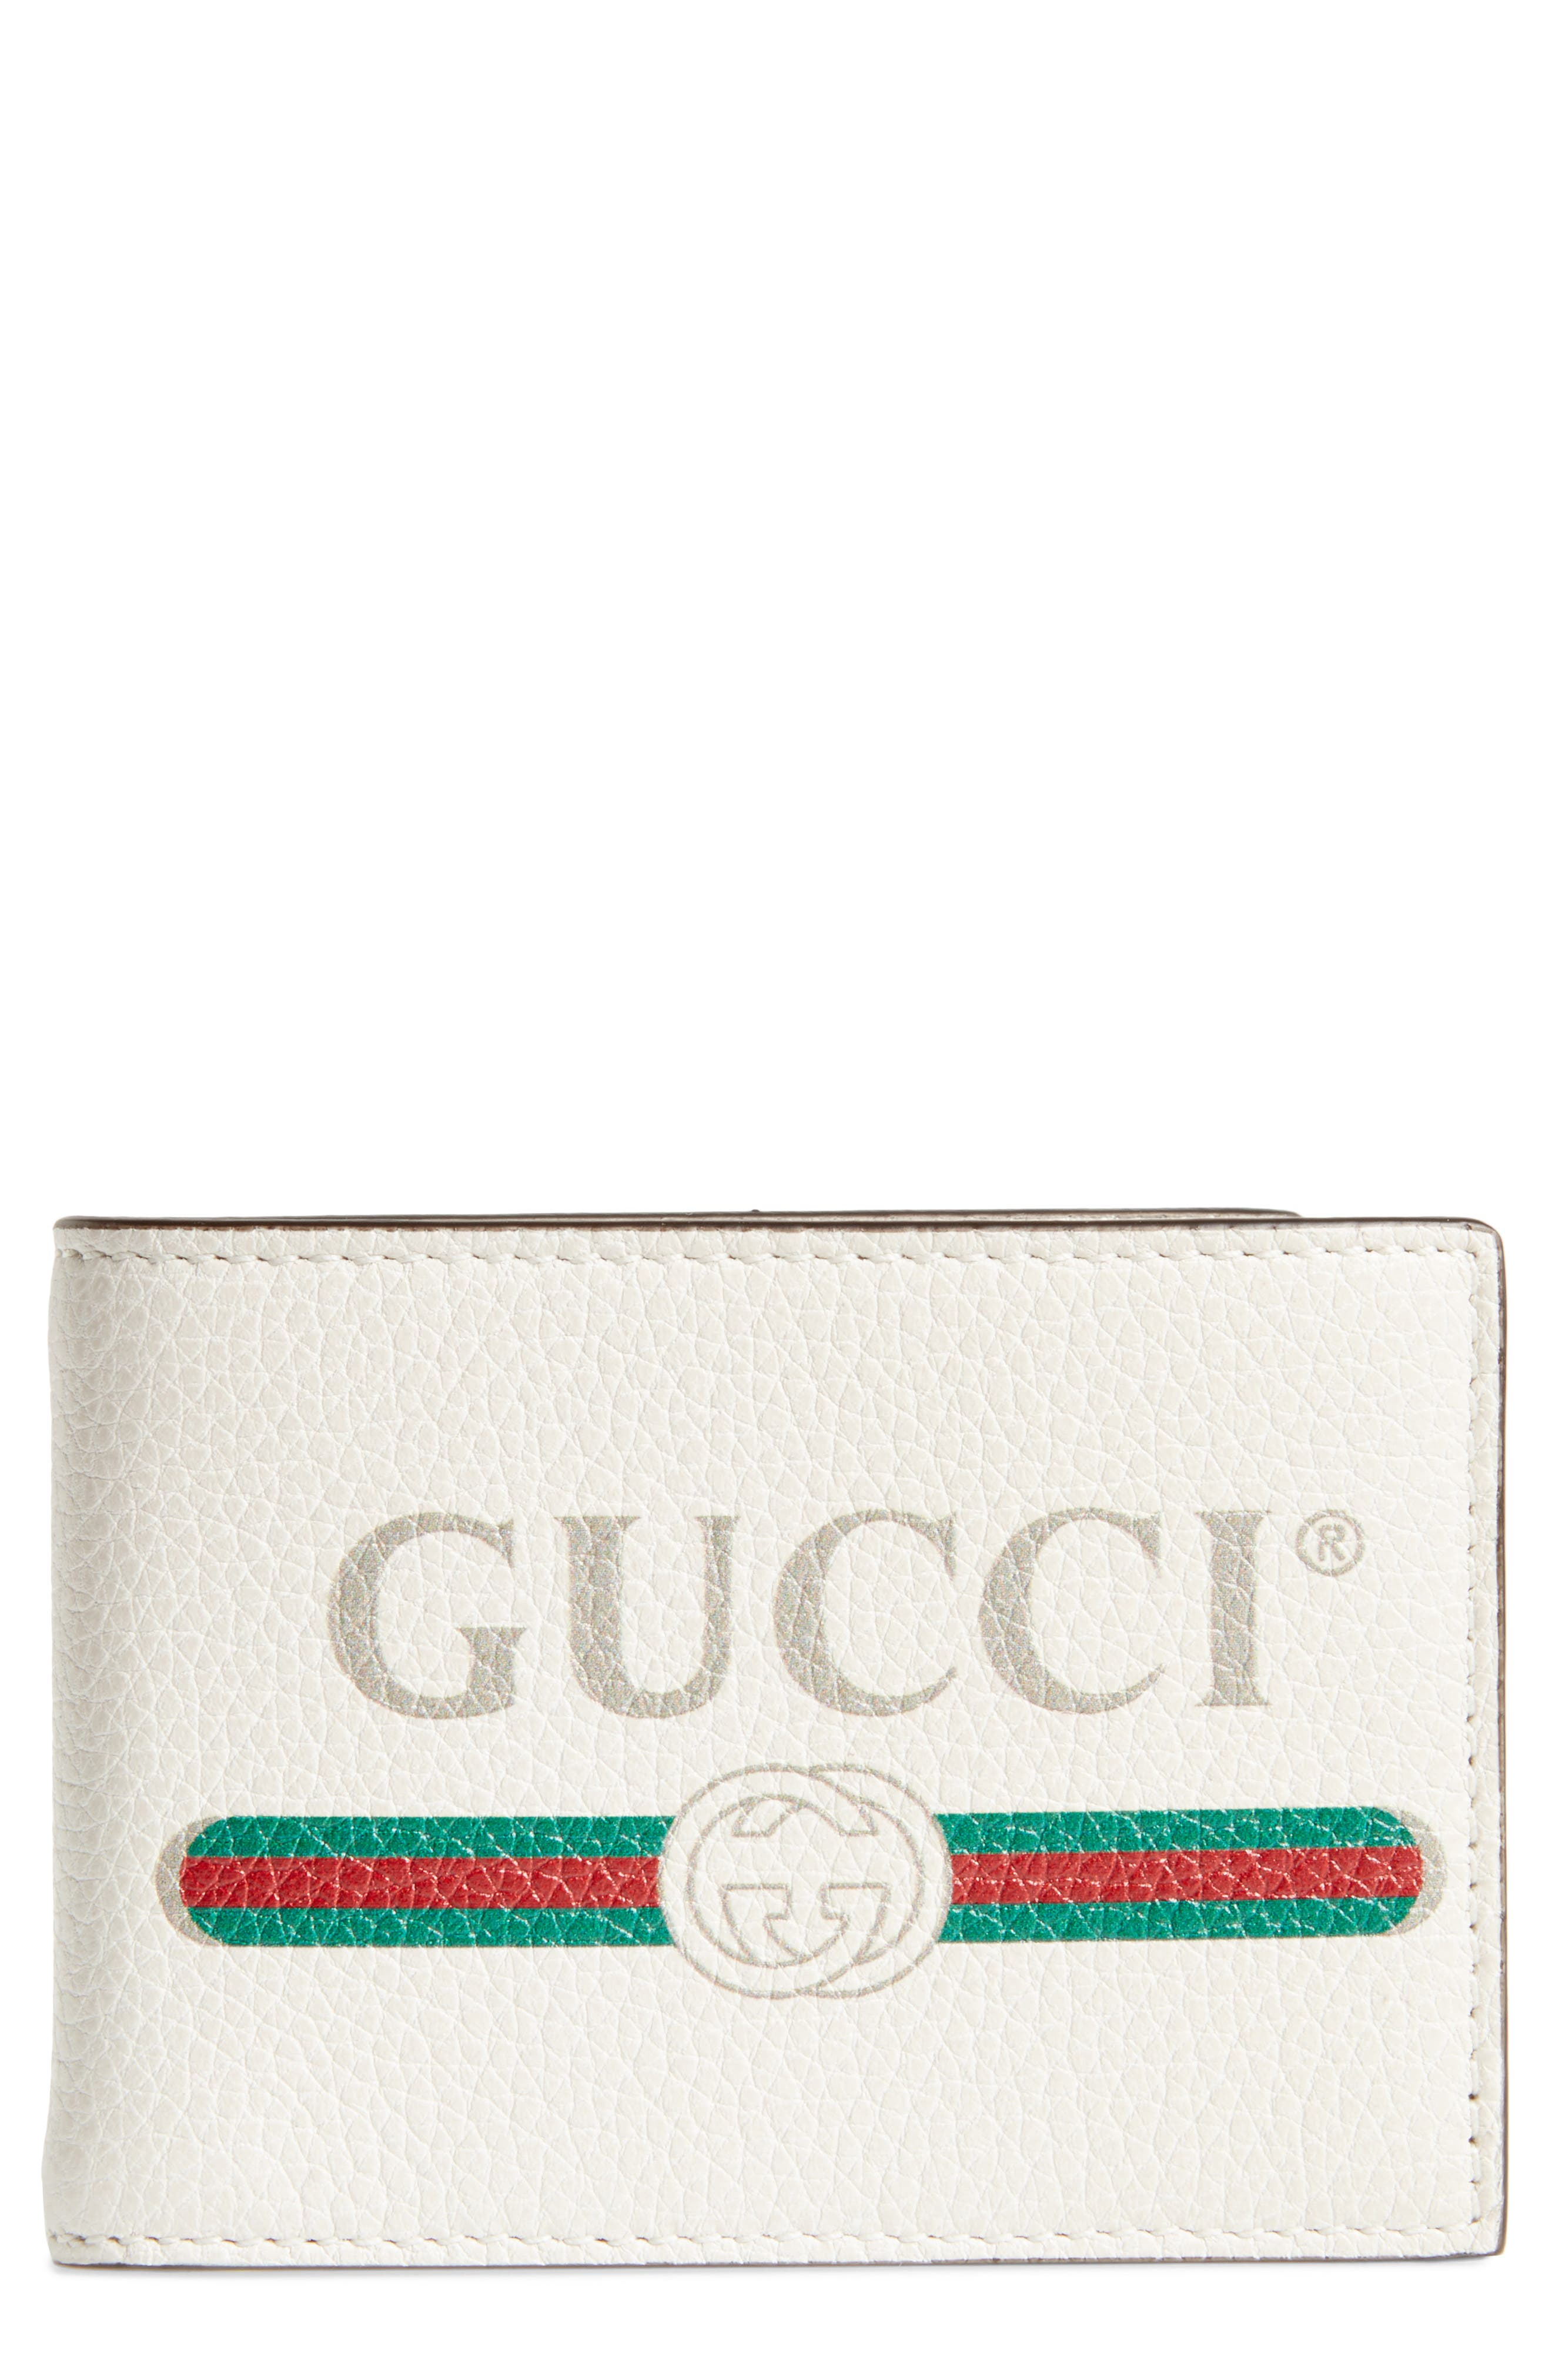 Wallet,                             Main thumbnail 1, color,                             WHITE